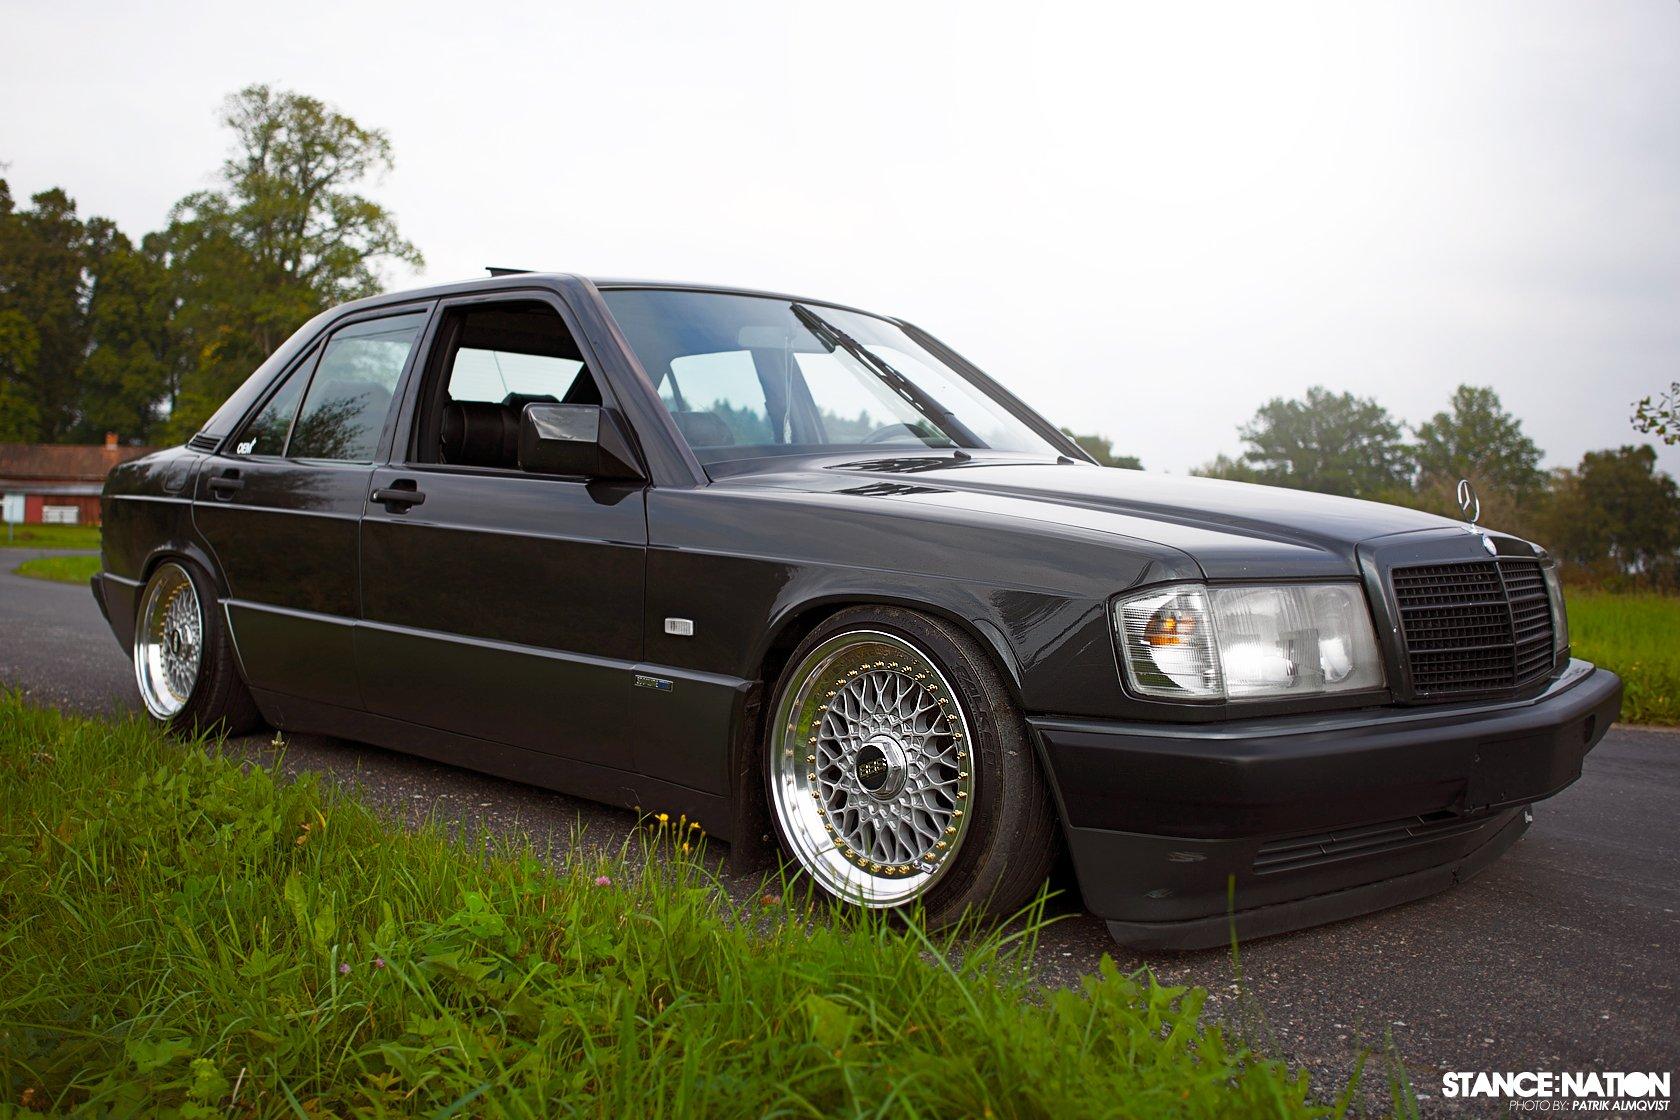 Mercedes w210 tuning 2 tuning cars - 1991 Mercedes Benz W201 Custom Tuning Wallpaper 1680x1120 845586 Wallpaperup